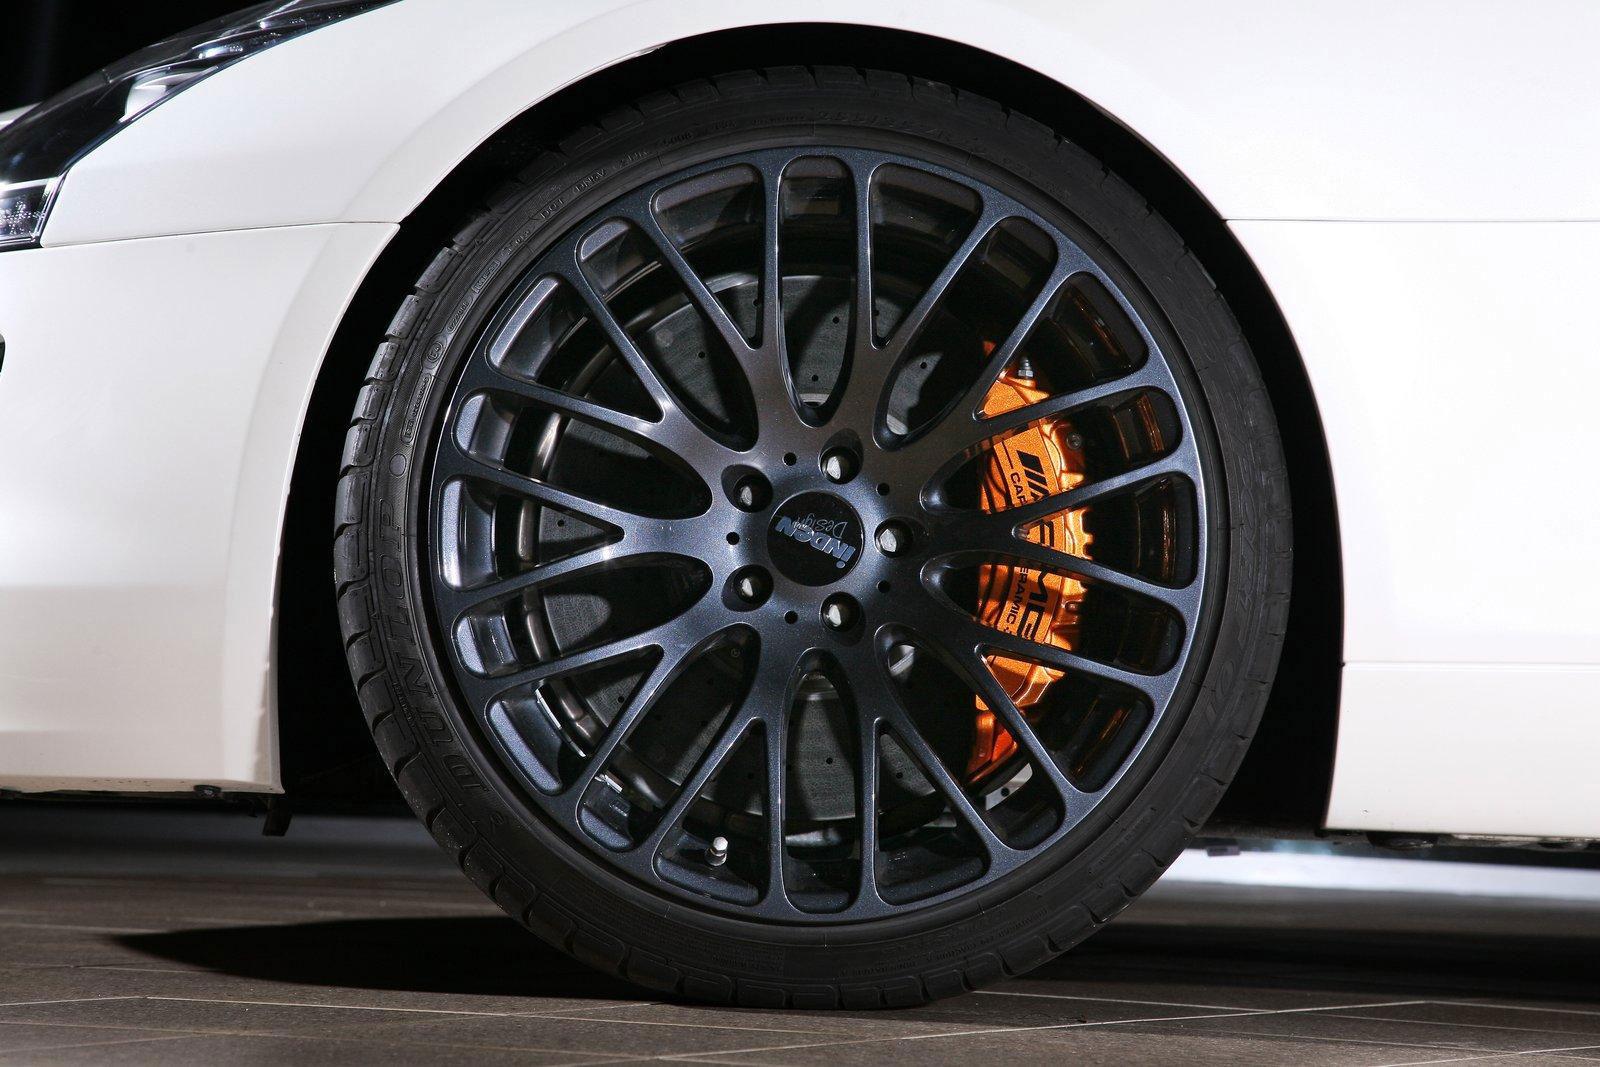 Mercedes-Benz SLS AMG dostal od Inden Design pár koní navíc 5